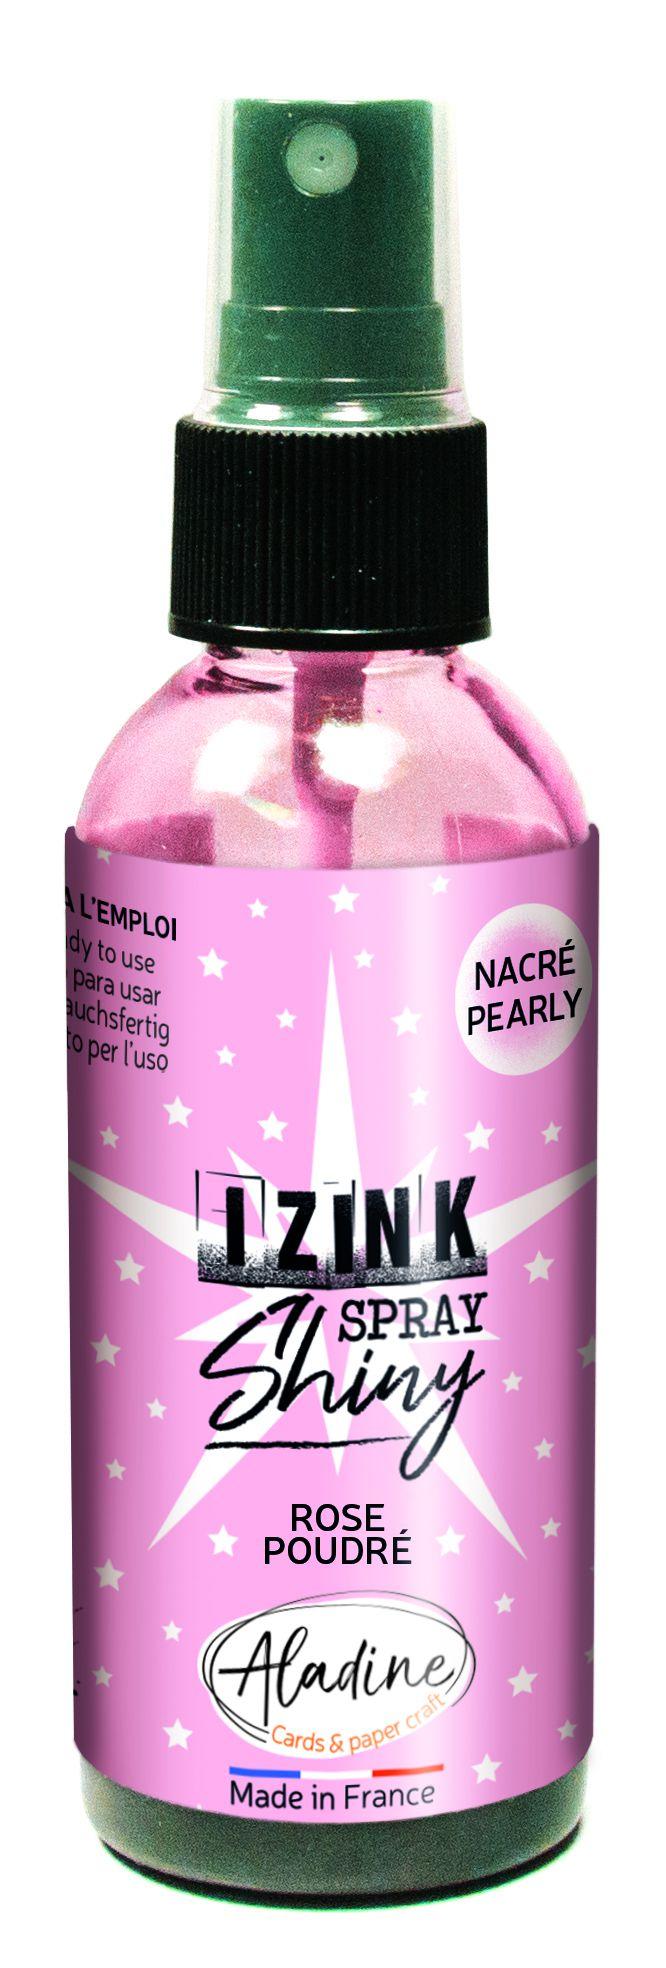 ENCRE IZINK AUX REFLETS NACRES - Rose Poudré